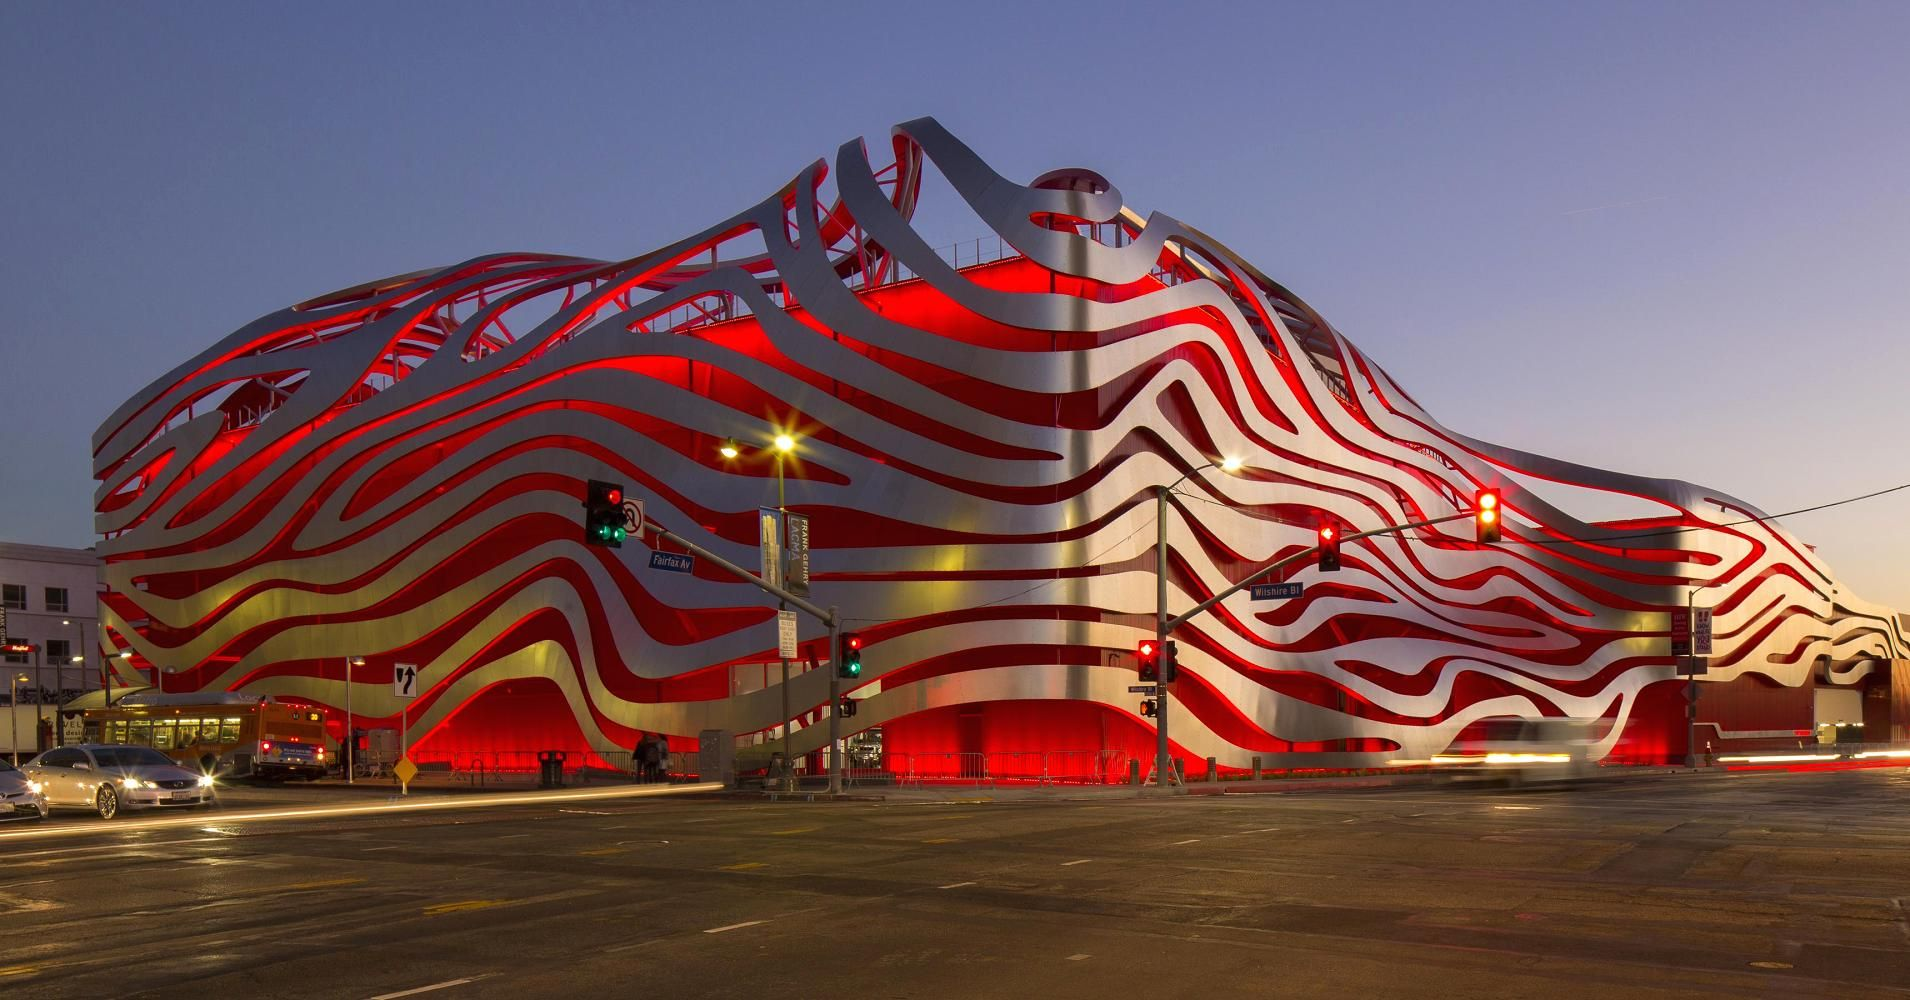 Car Lover S Dream La S Petersen Museum Reopens Cnbc Los Angeles Museum American Architecture Museum